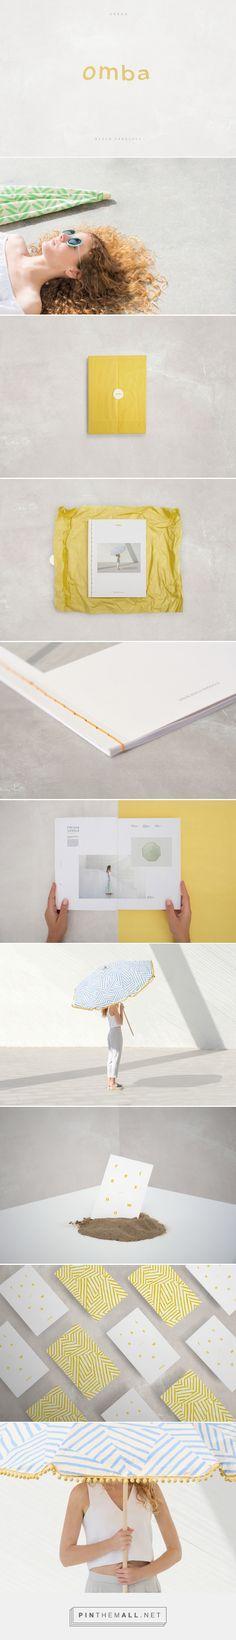 OMBA Urban Beach Parasols Branding by Tatabi Studio | Fivestar Branding – Design and Branding Agency & Inspiration Gallery